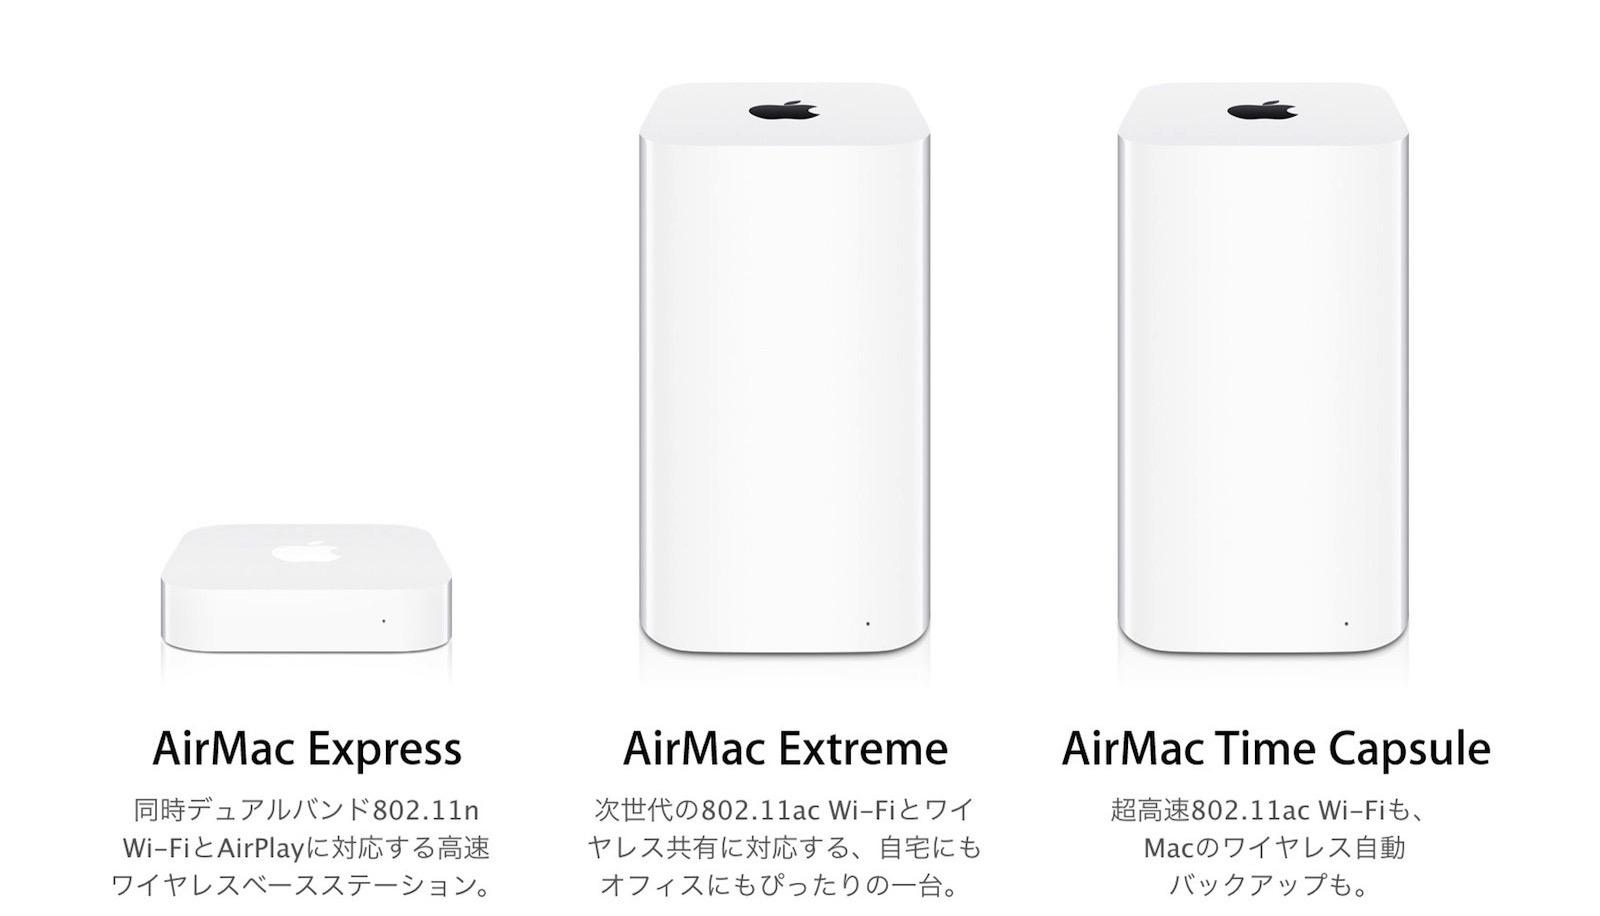 AirMac Series Ending